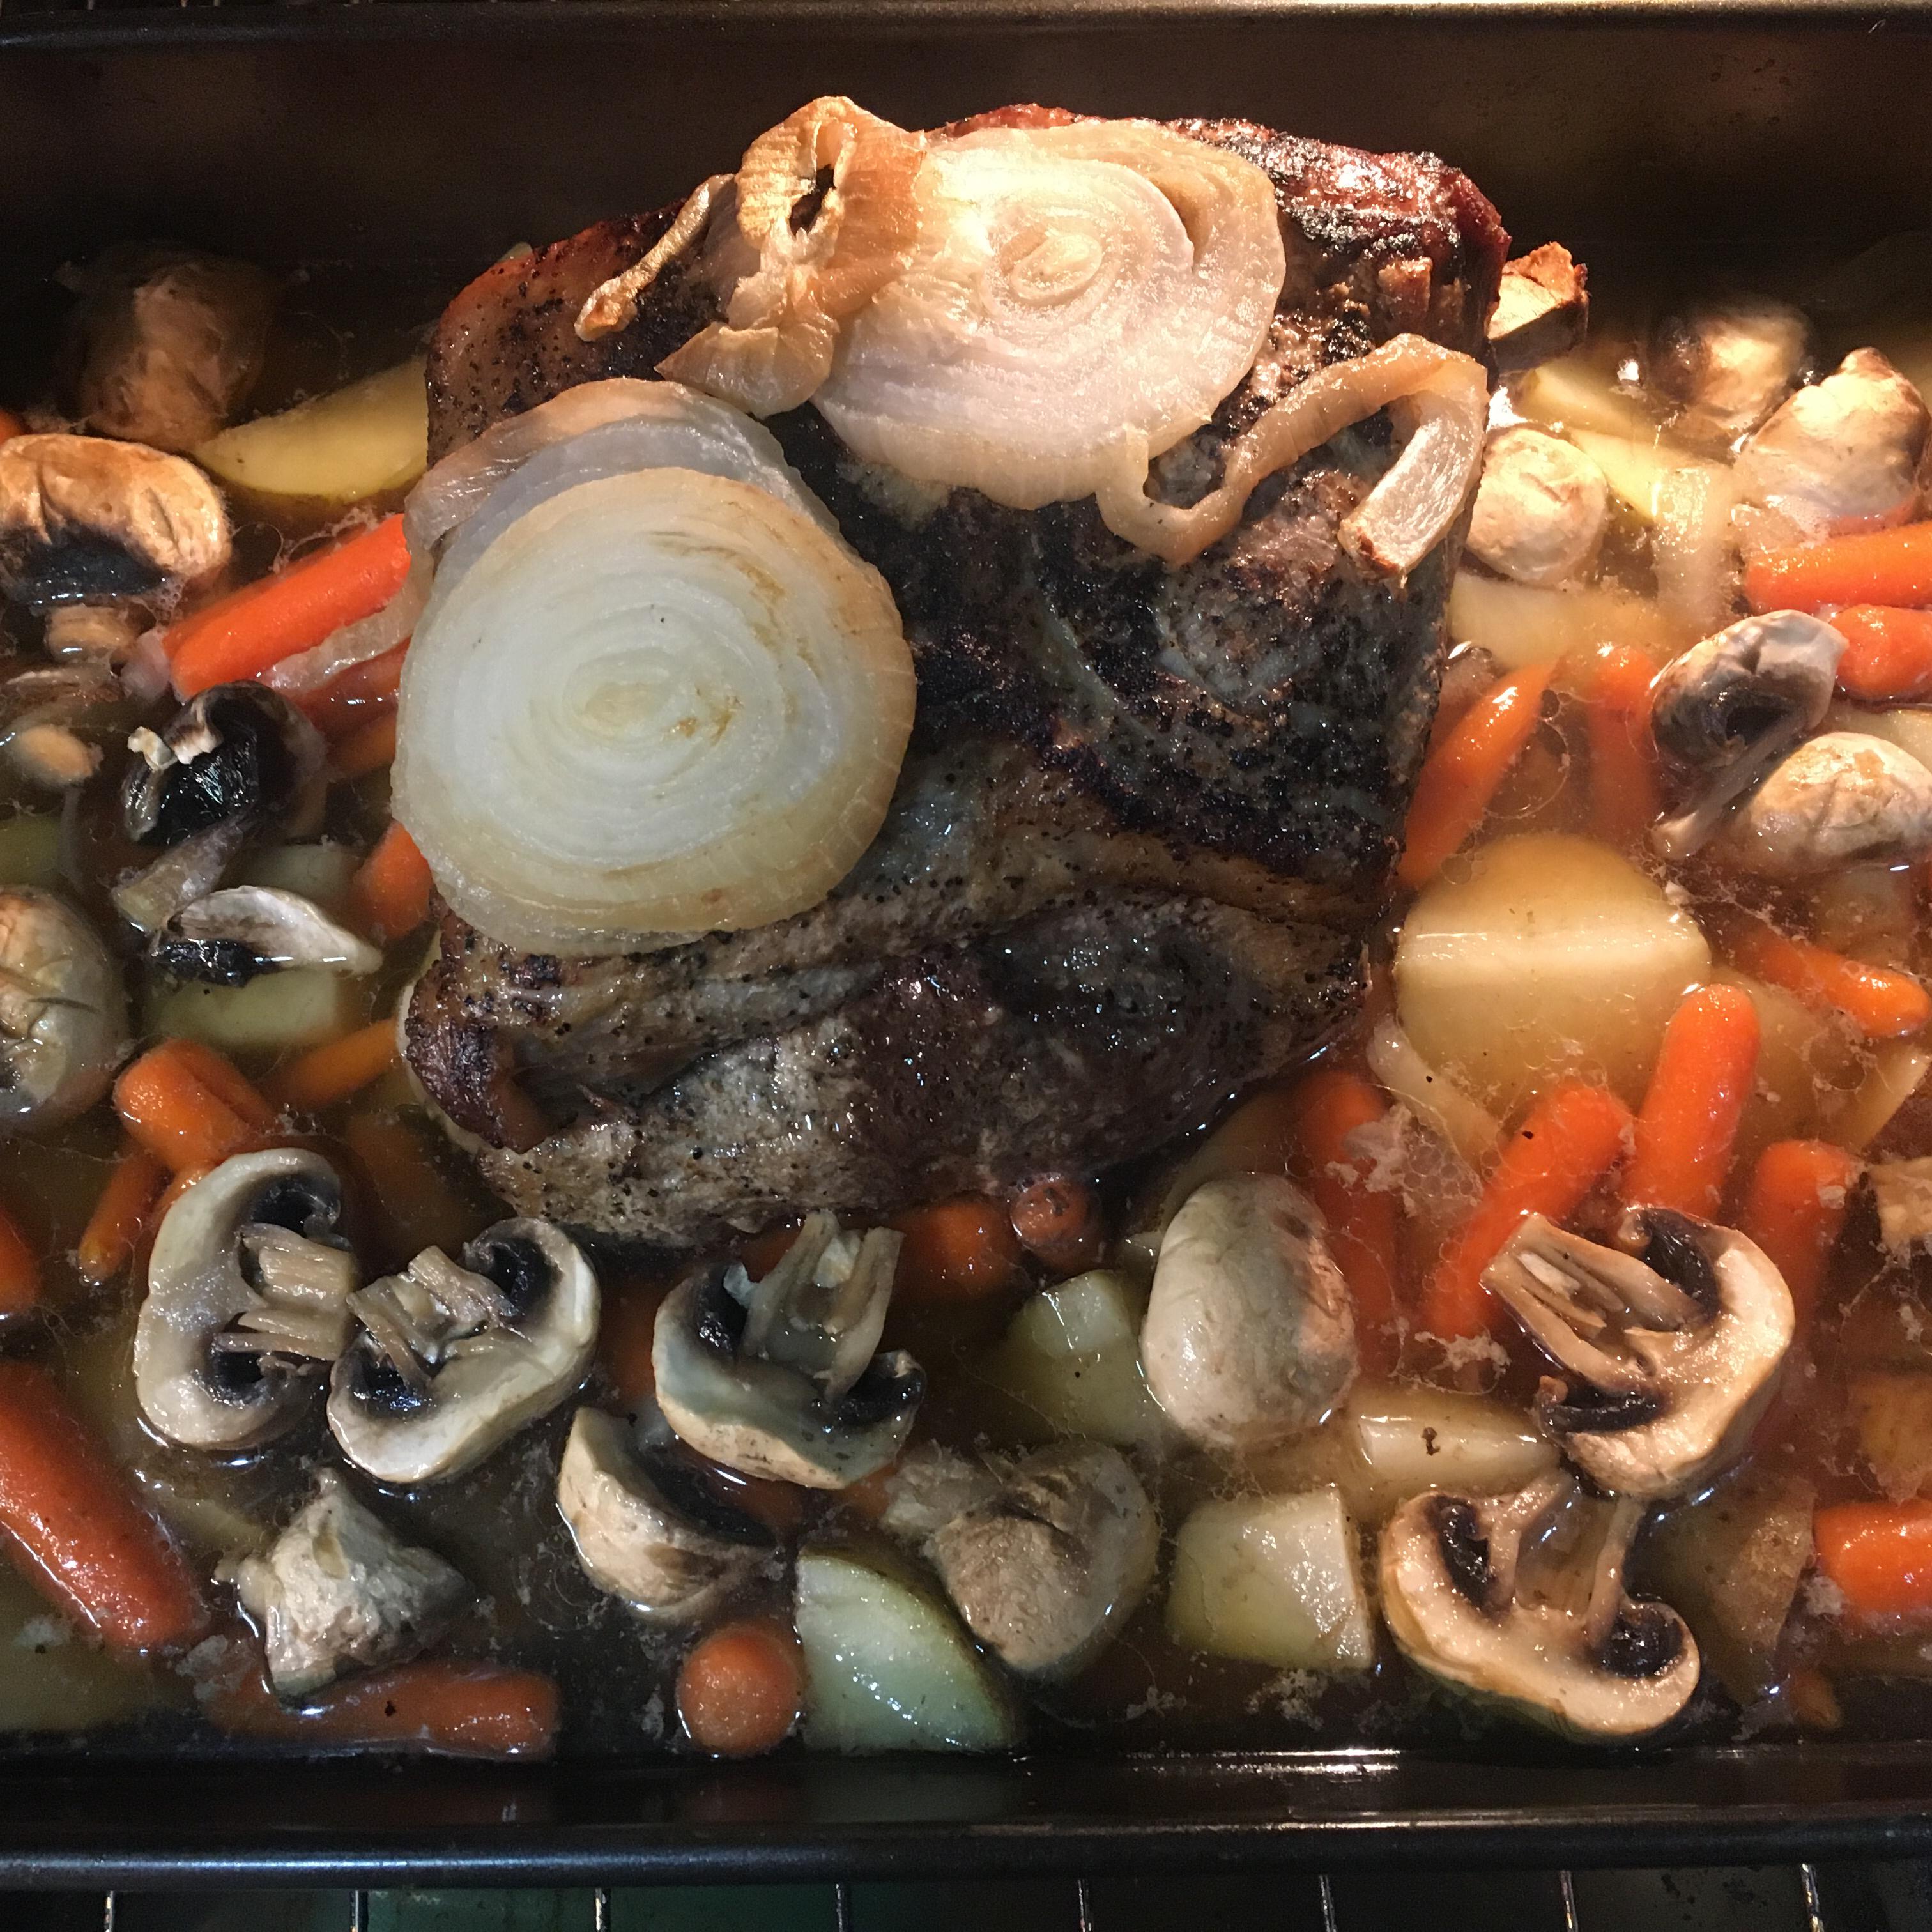 Pork Butt Roast with Vegetables